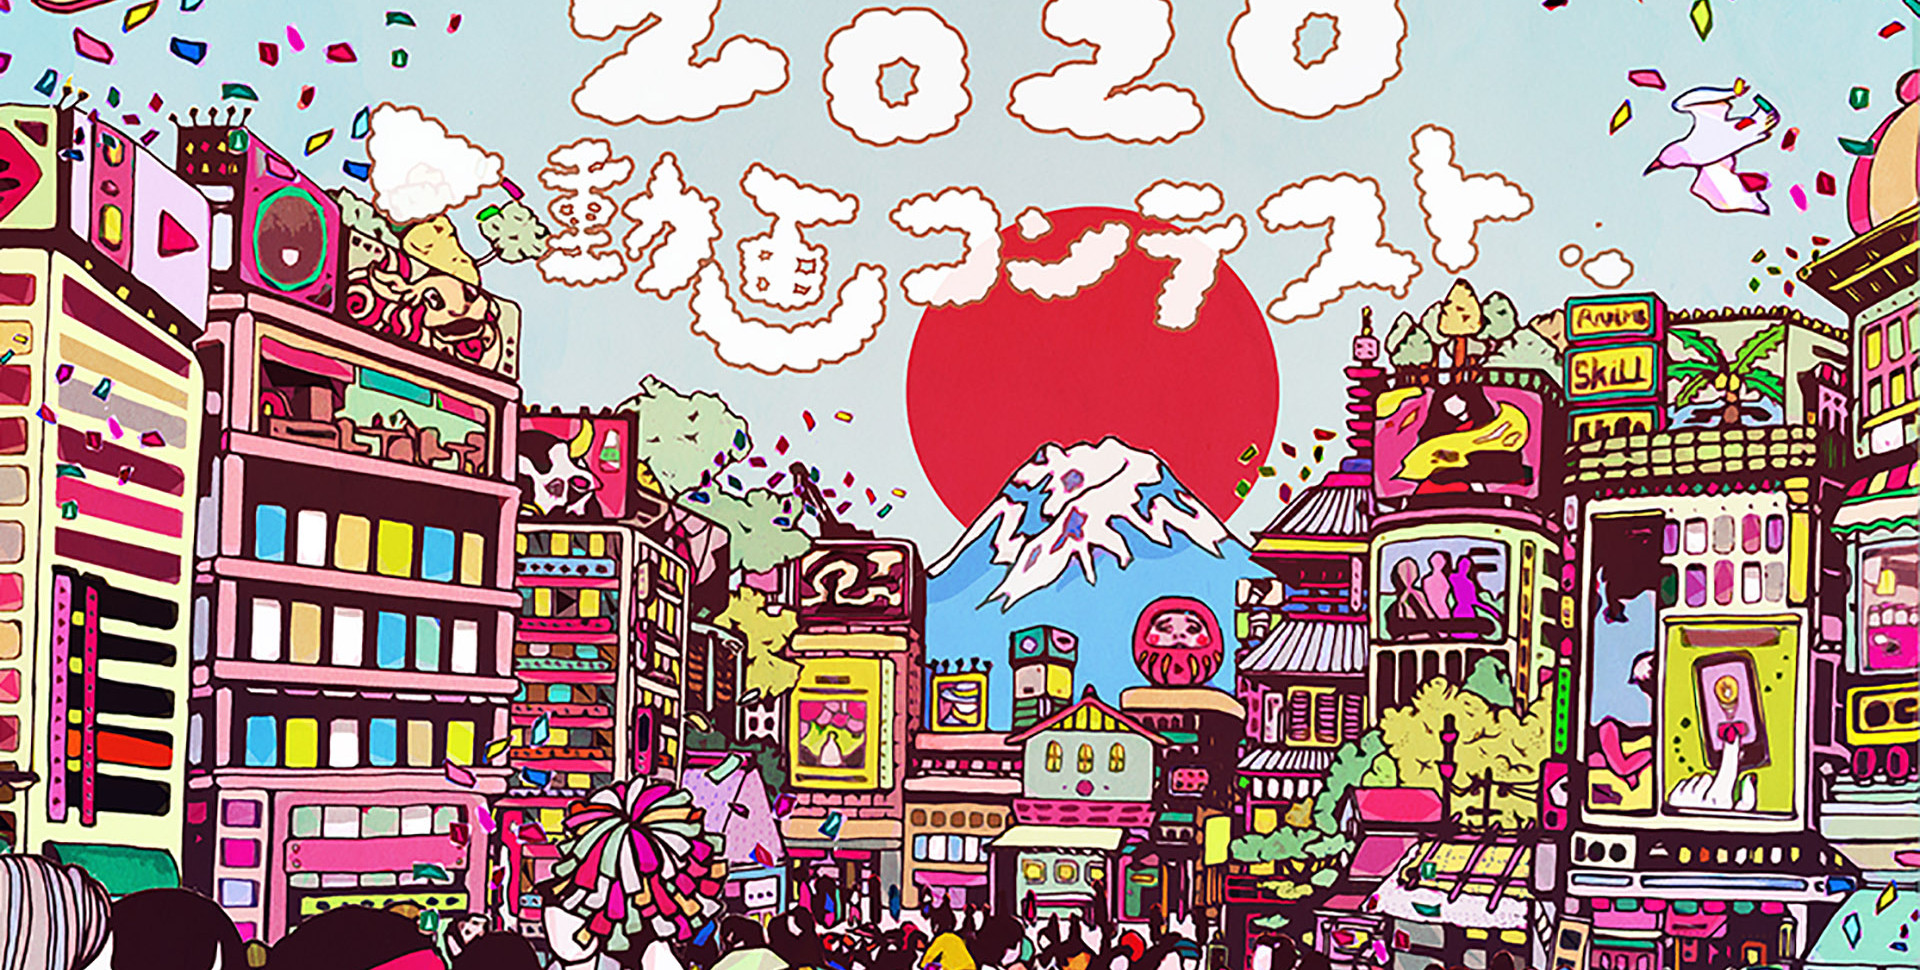 1_Hure Hure 2020_Title.jpg